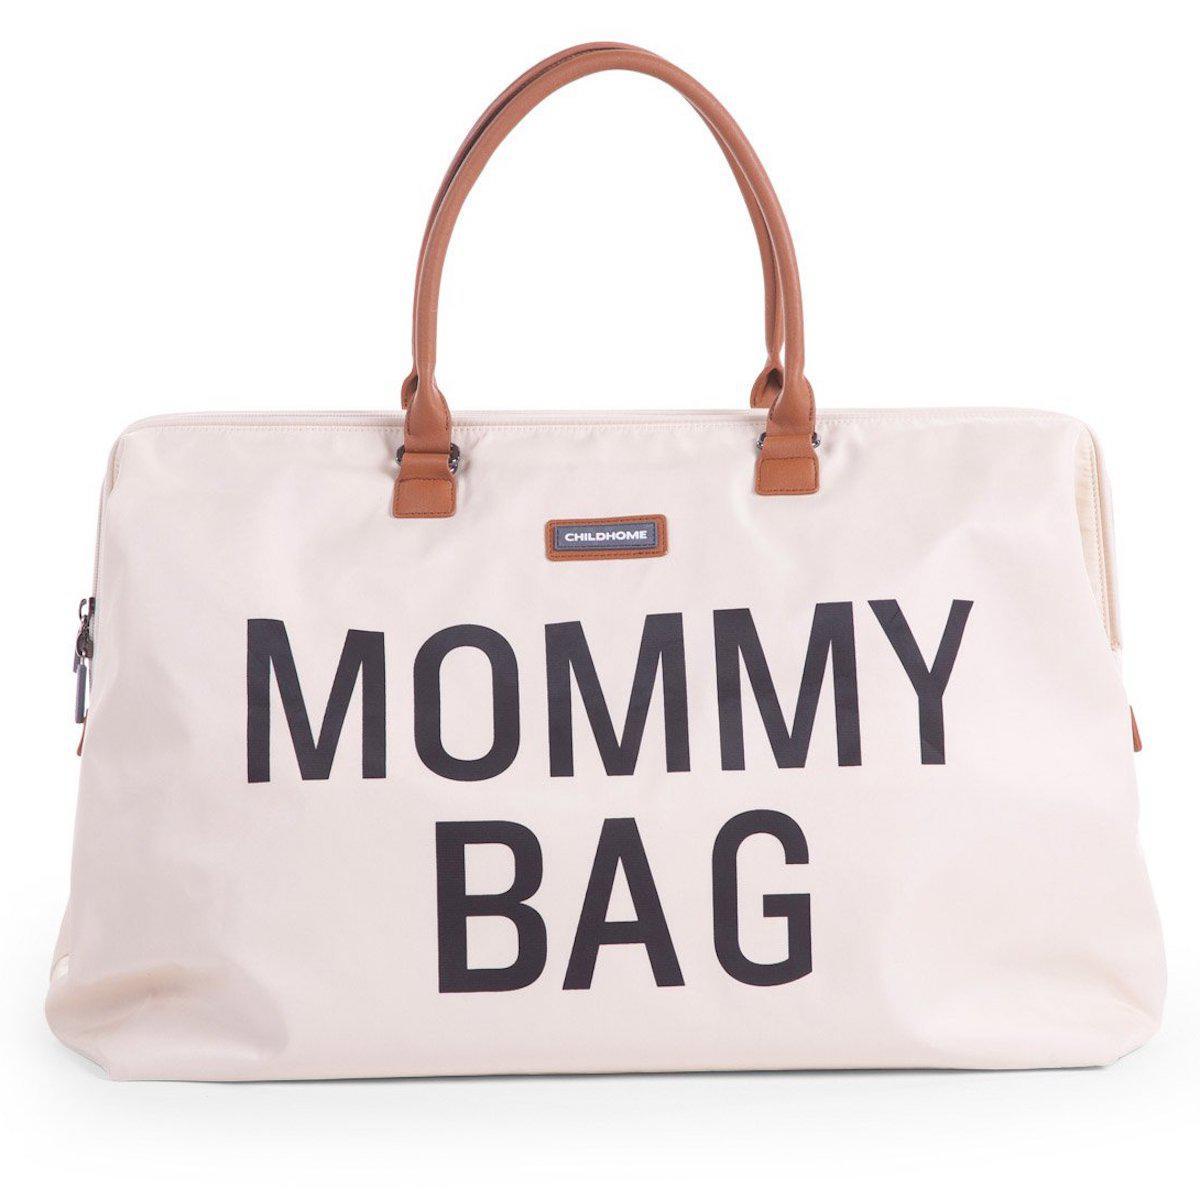 Sac à langer MOMMY BAG Childhome blanc cassé